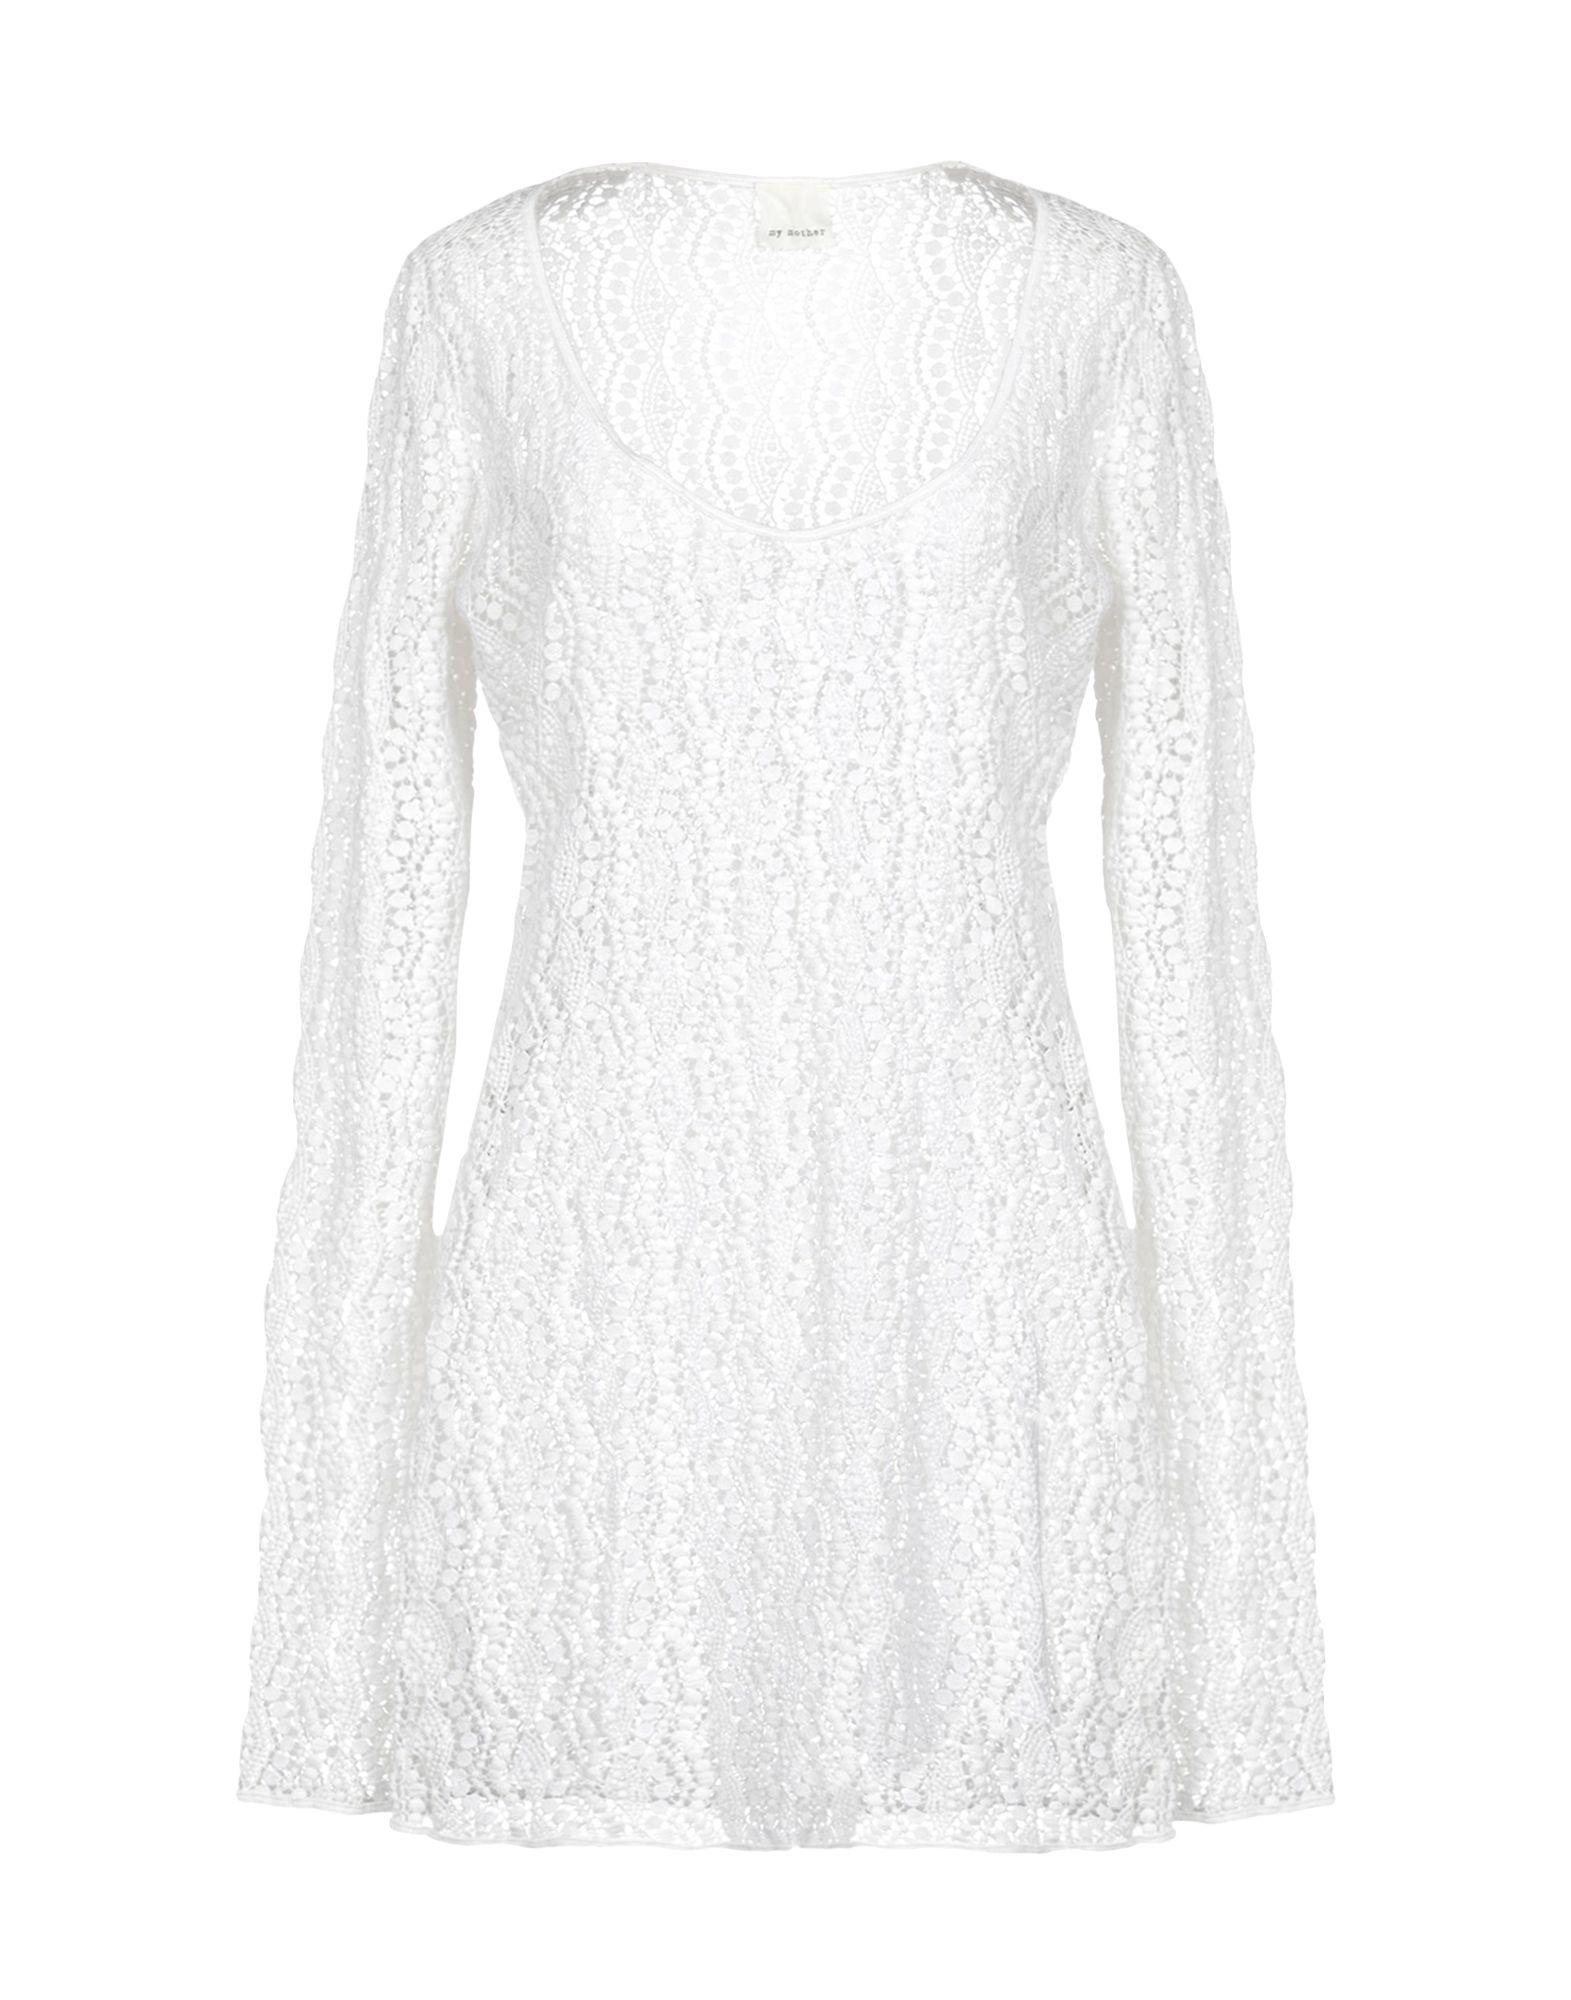 MY MOTHER Короткое платье платье quelle my size 1010322